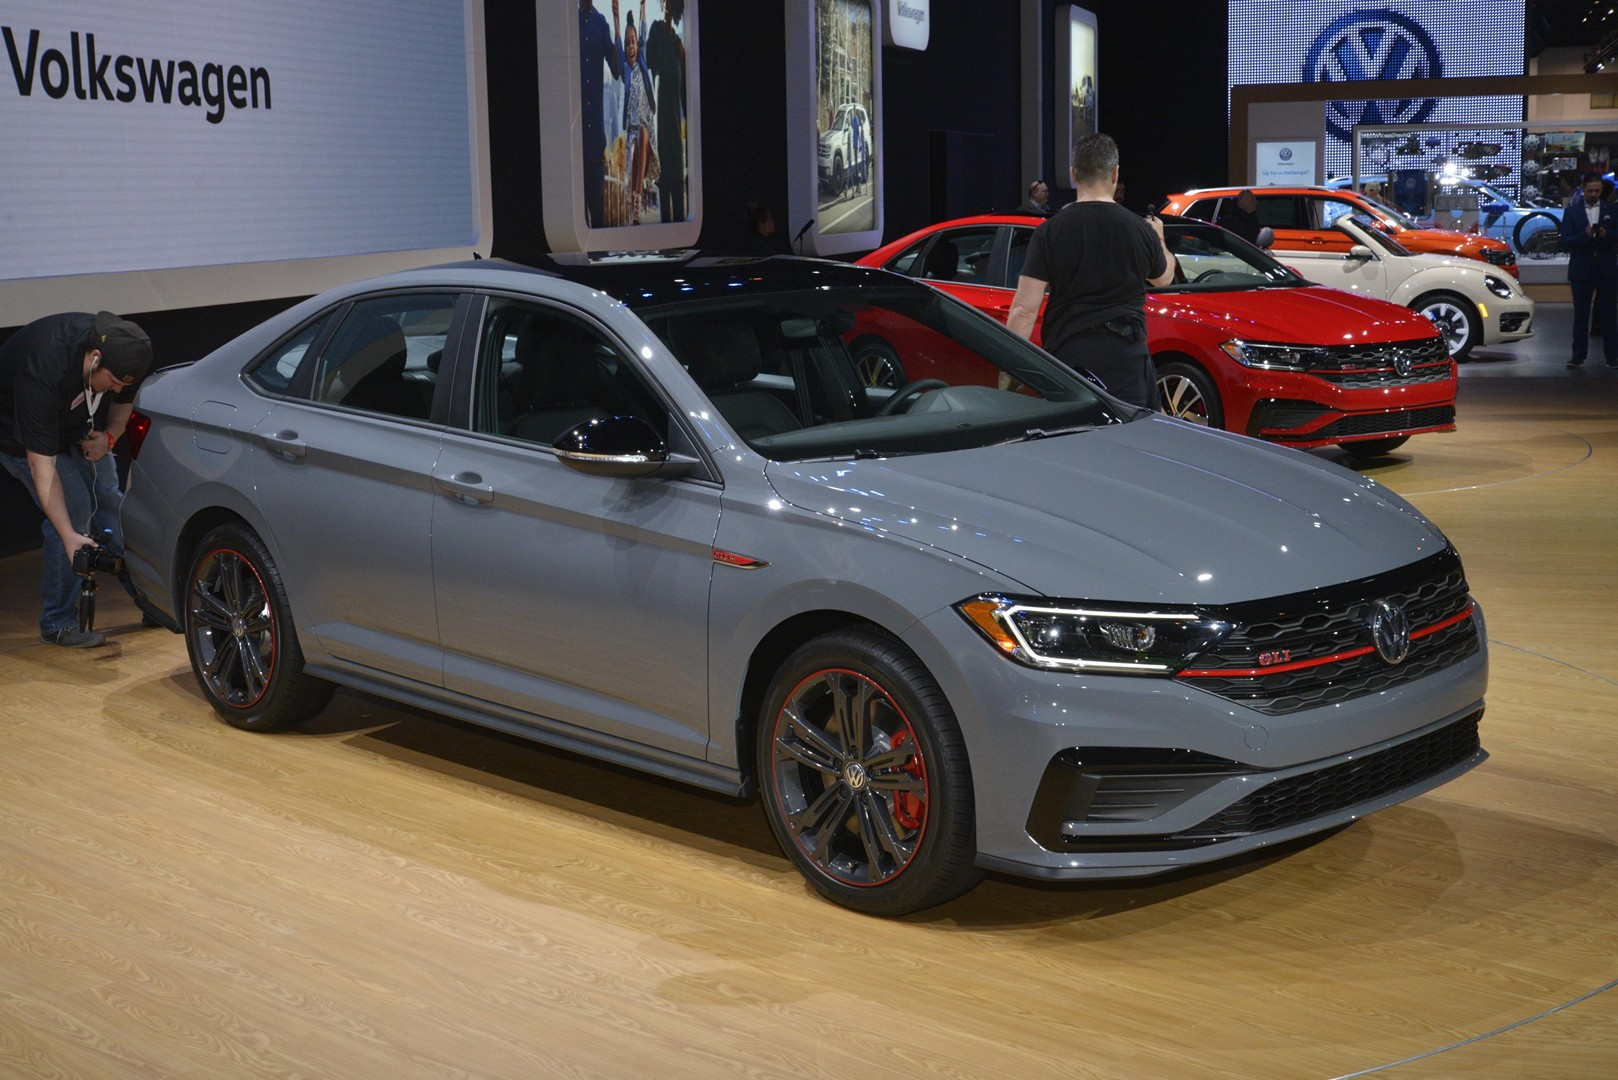 2019 Jetta GLI Shows Cool Gray Paint on 35th Anniversary Edition - autoevolution